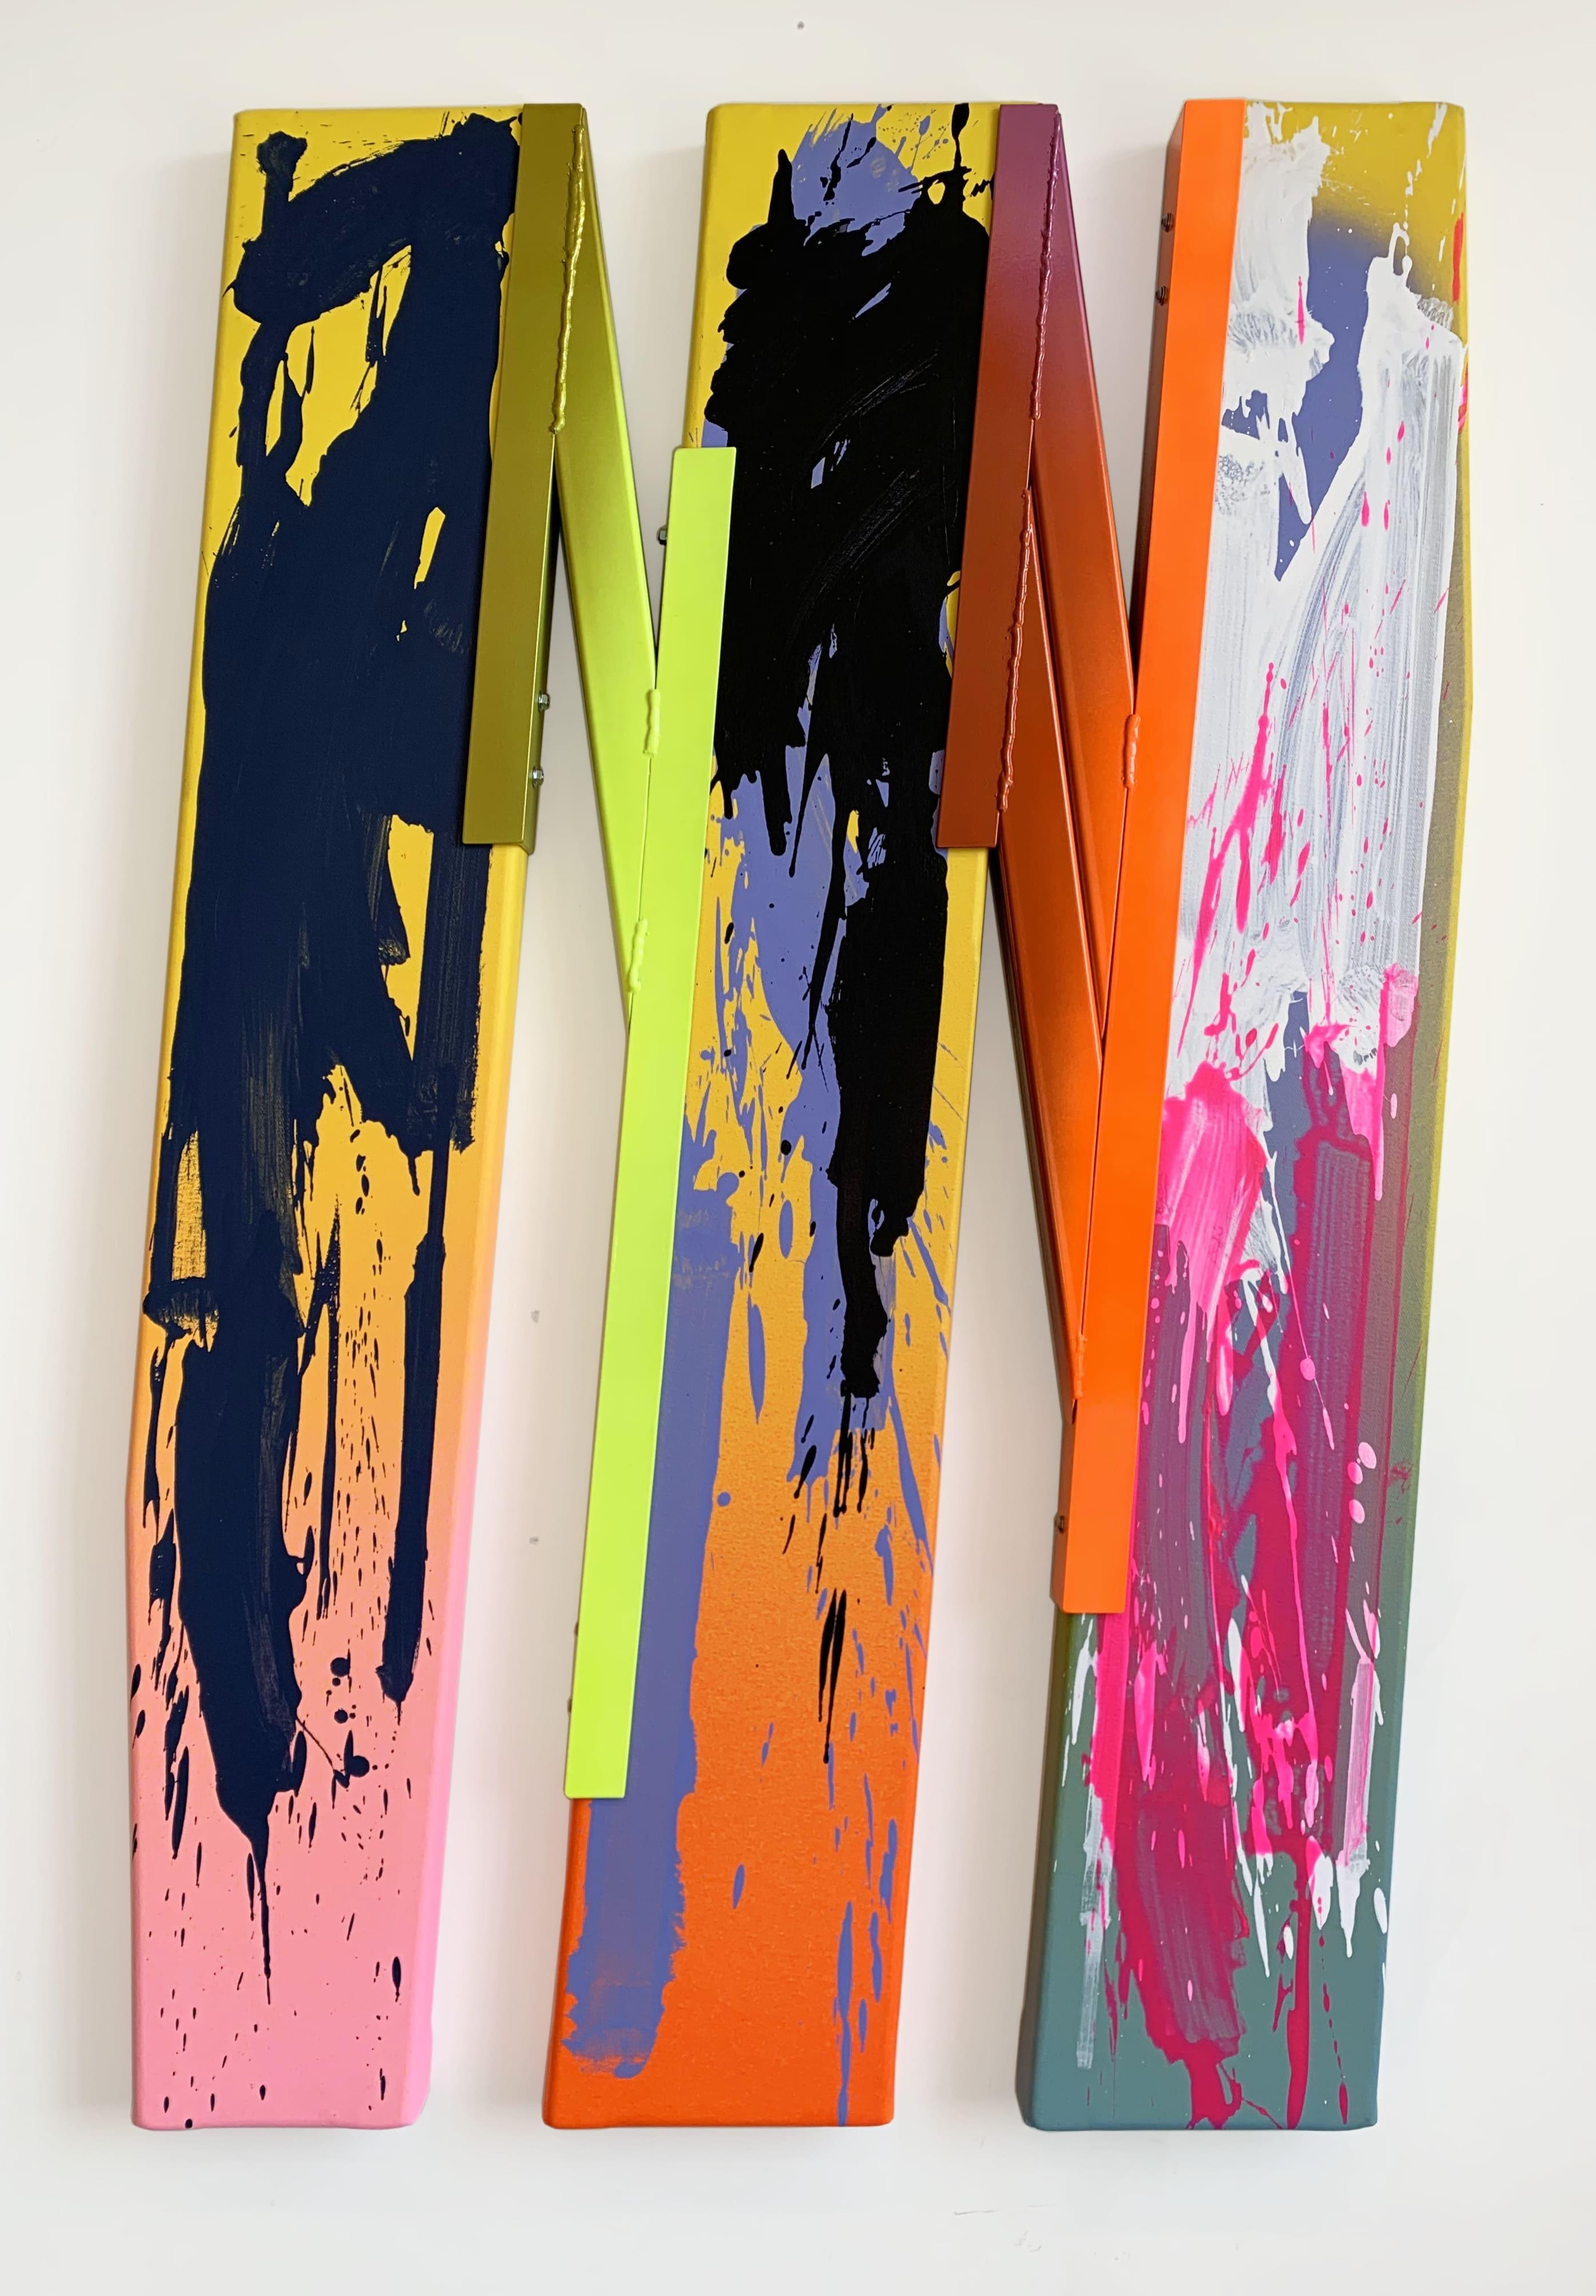 NemesM_The-Better-Self-05_2020_132x88cm_acrylic-carpaint-canvas-steel-wood-min